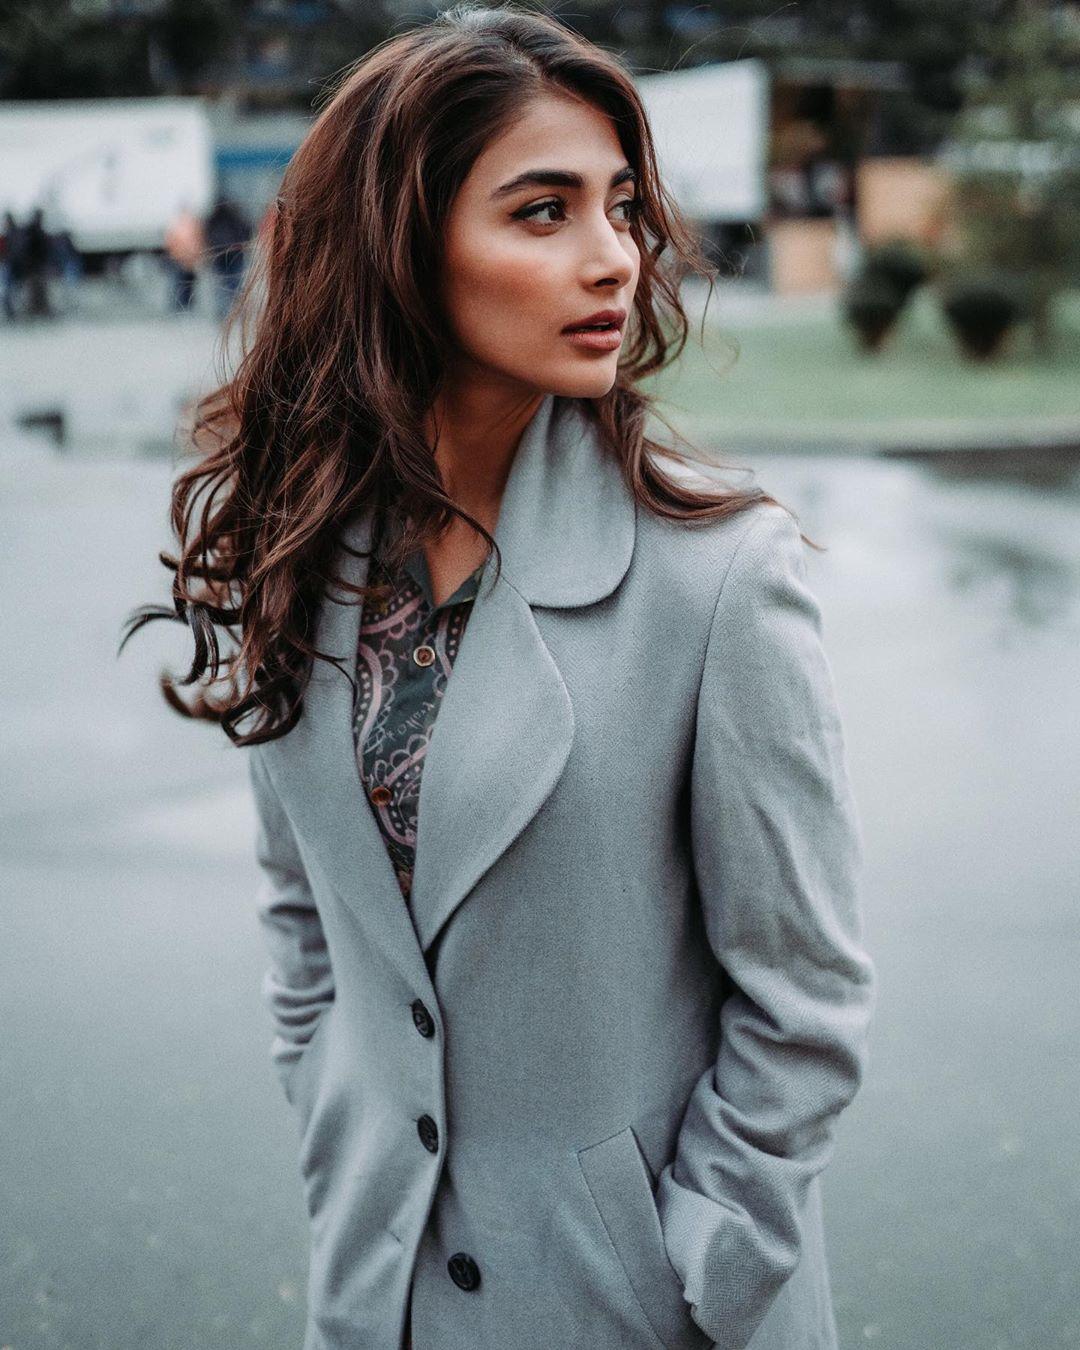 Pooja-Hegde-Wallpapers-Insta-Fit-Bio-11